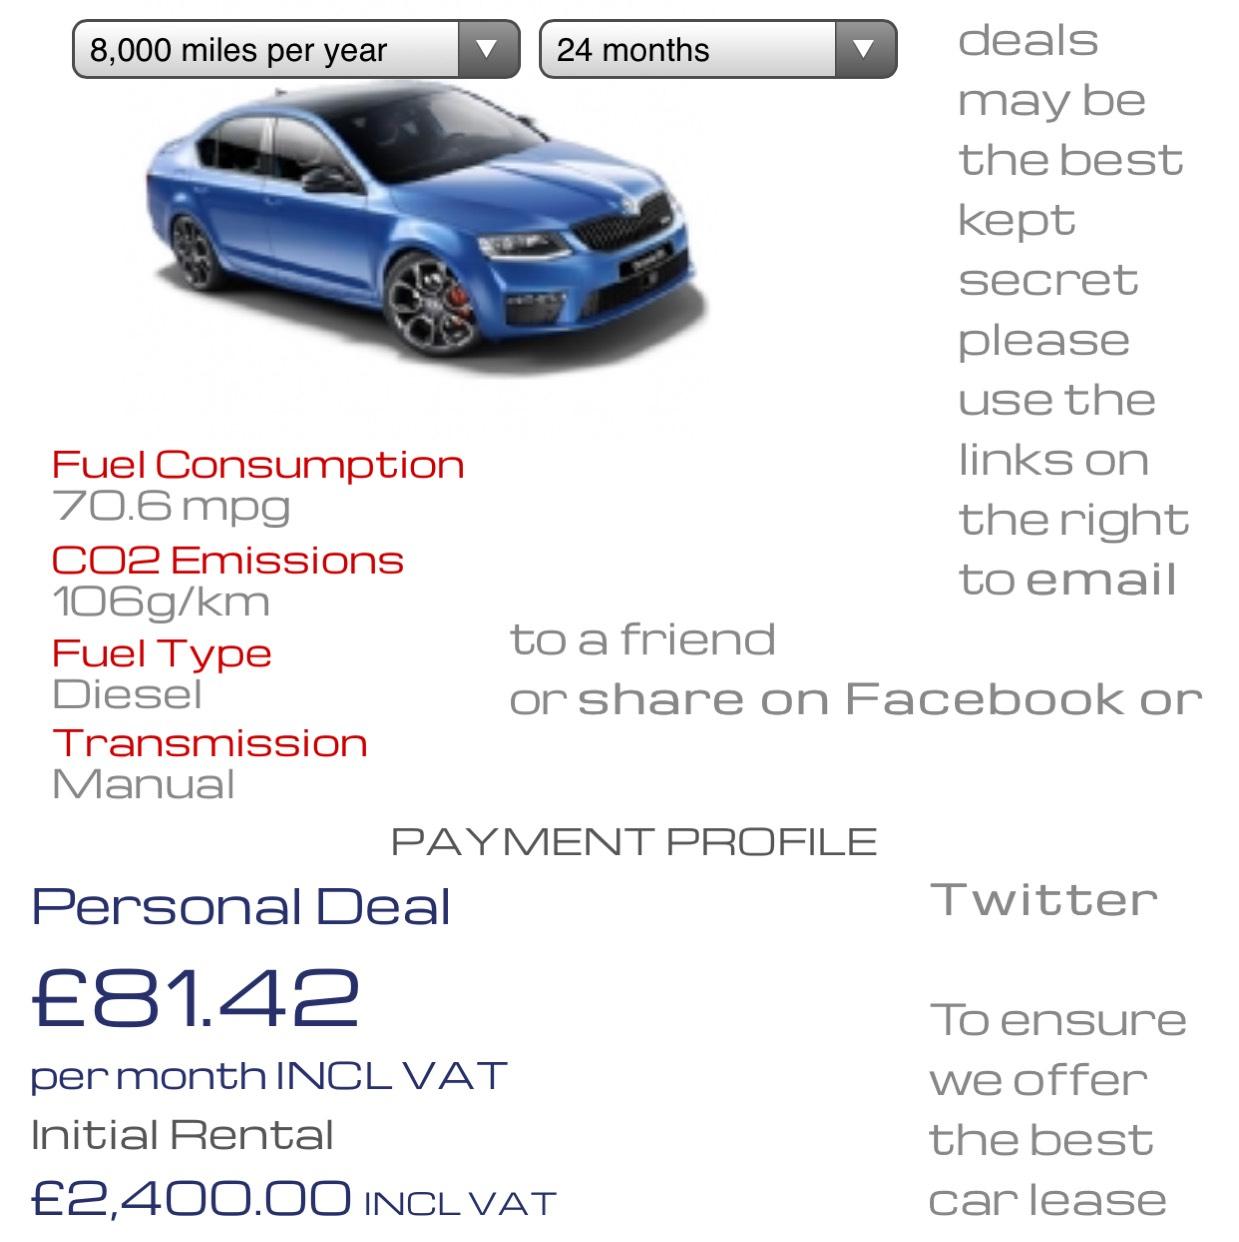 Skoda Octavia 2.0 TDI CR SE TECH Lease £2400 Deposit, £81.42 x 23 £239.99 admin fee Total £4,512.65 at NVS